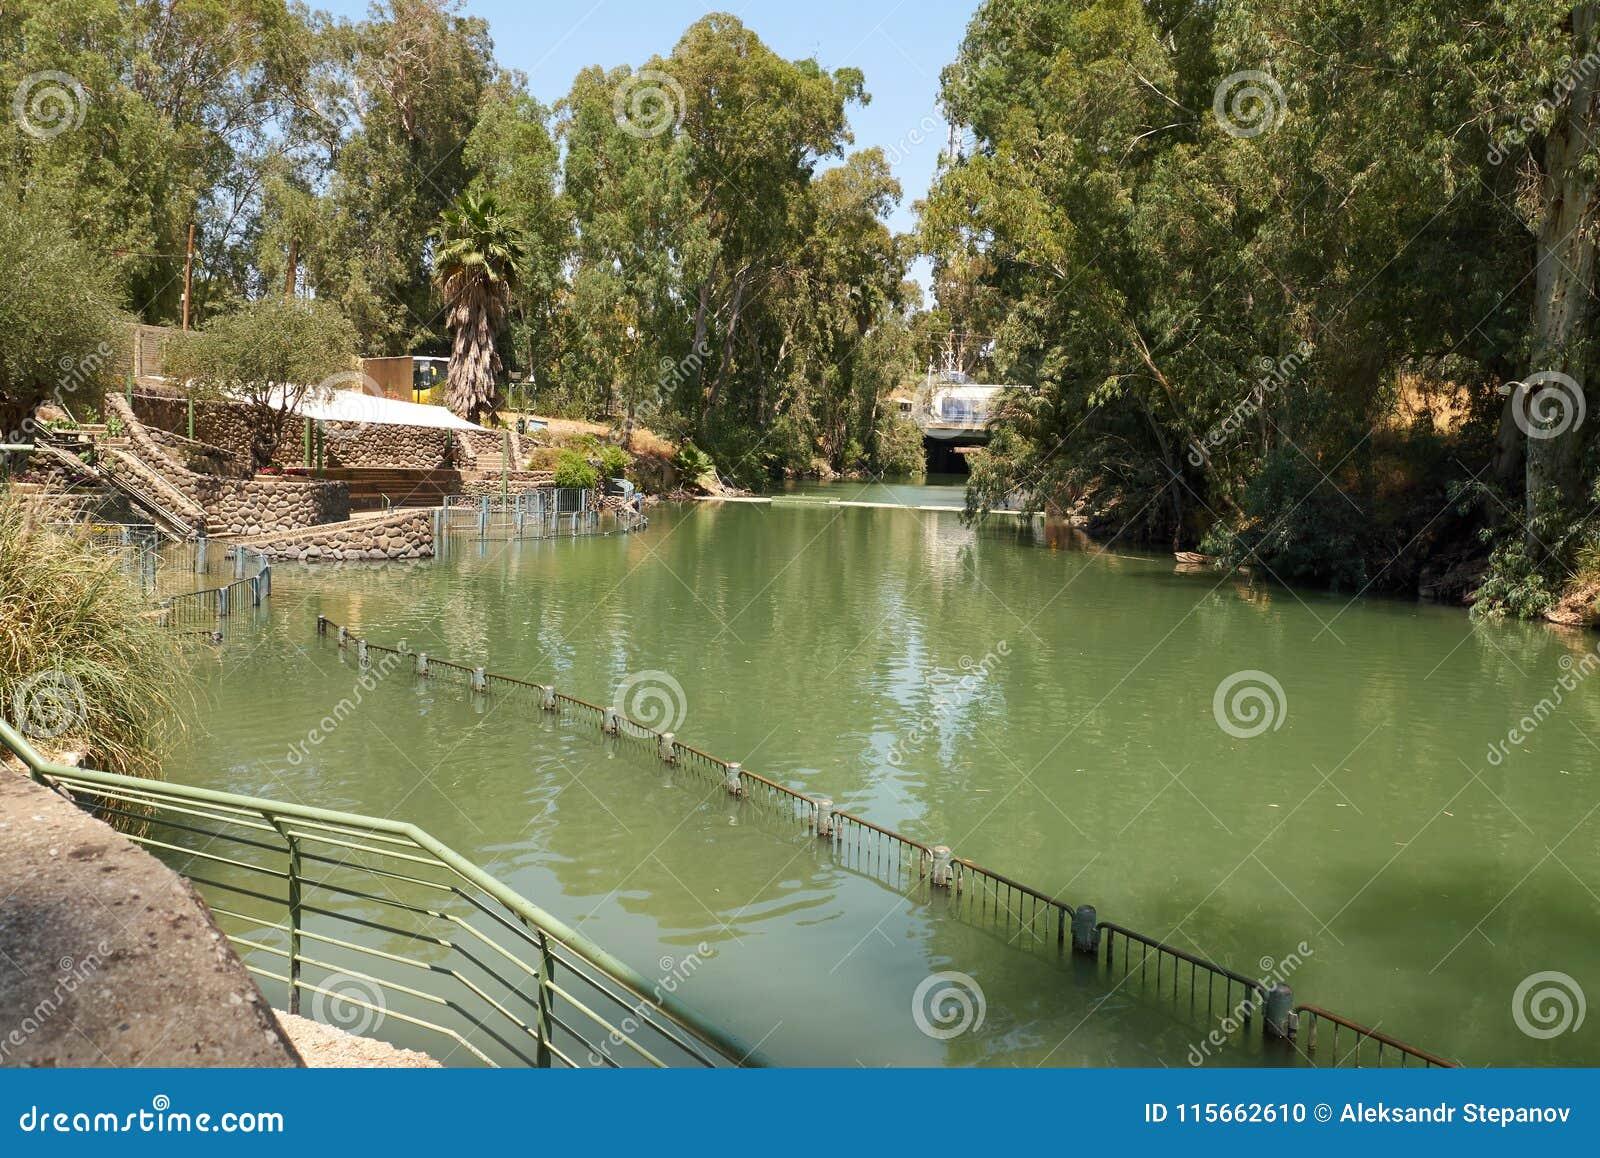 57de484d7780 Yardenit Baptism Site On A Jordan River In Israel Stock Photo ...